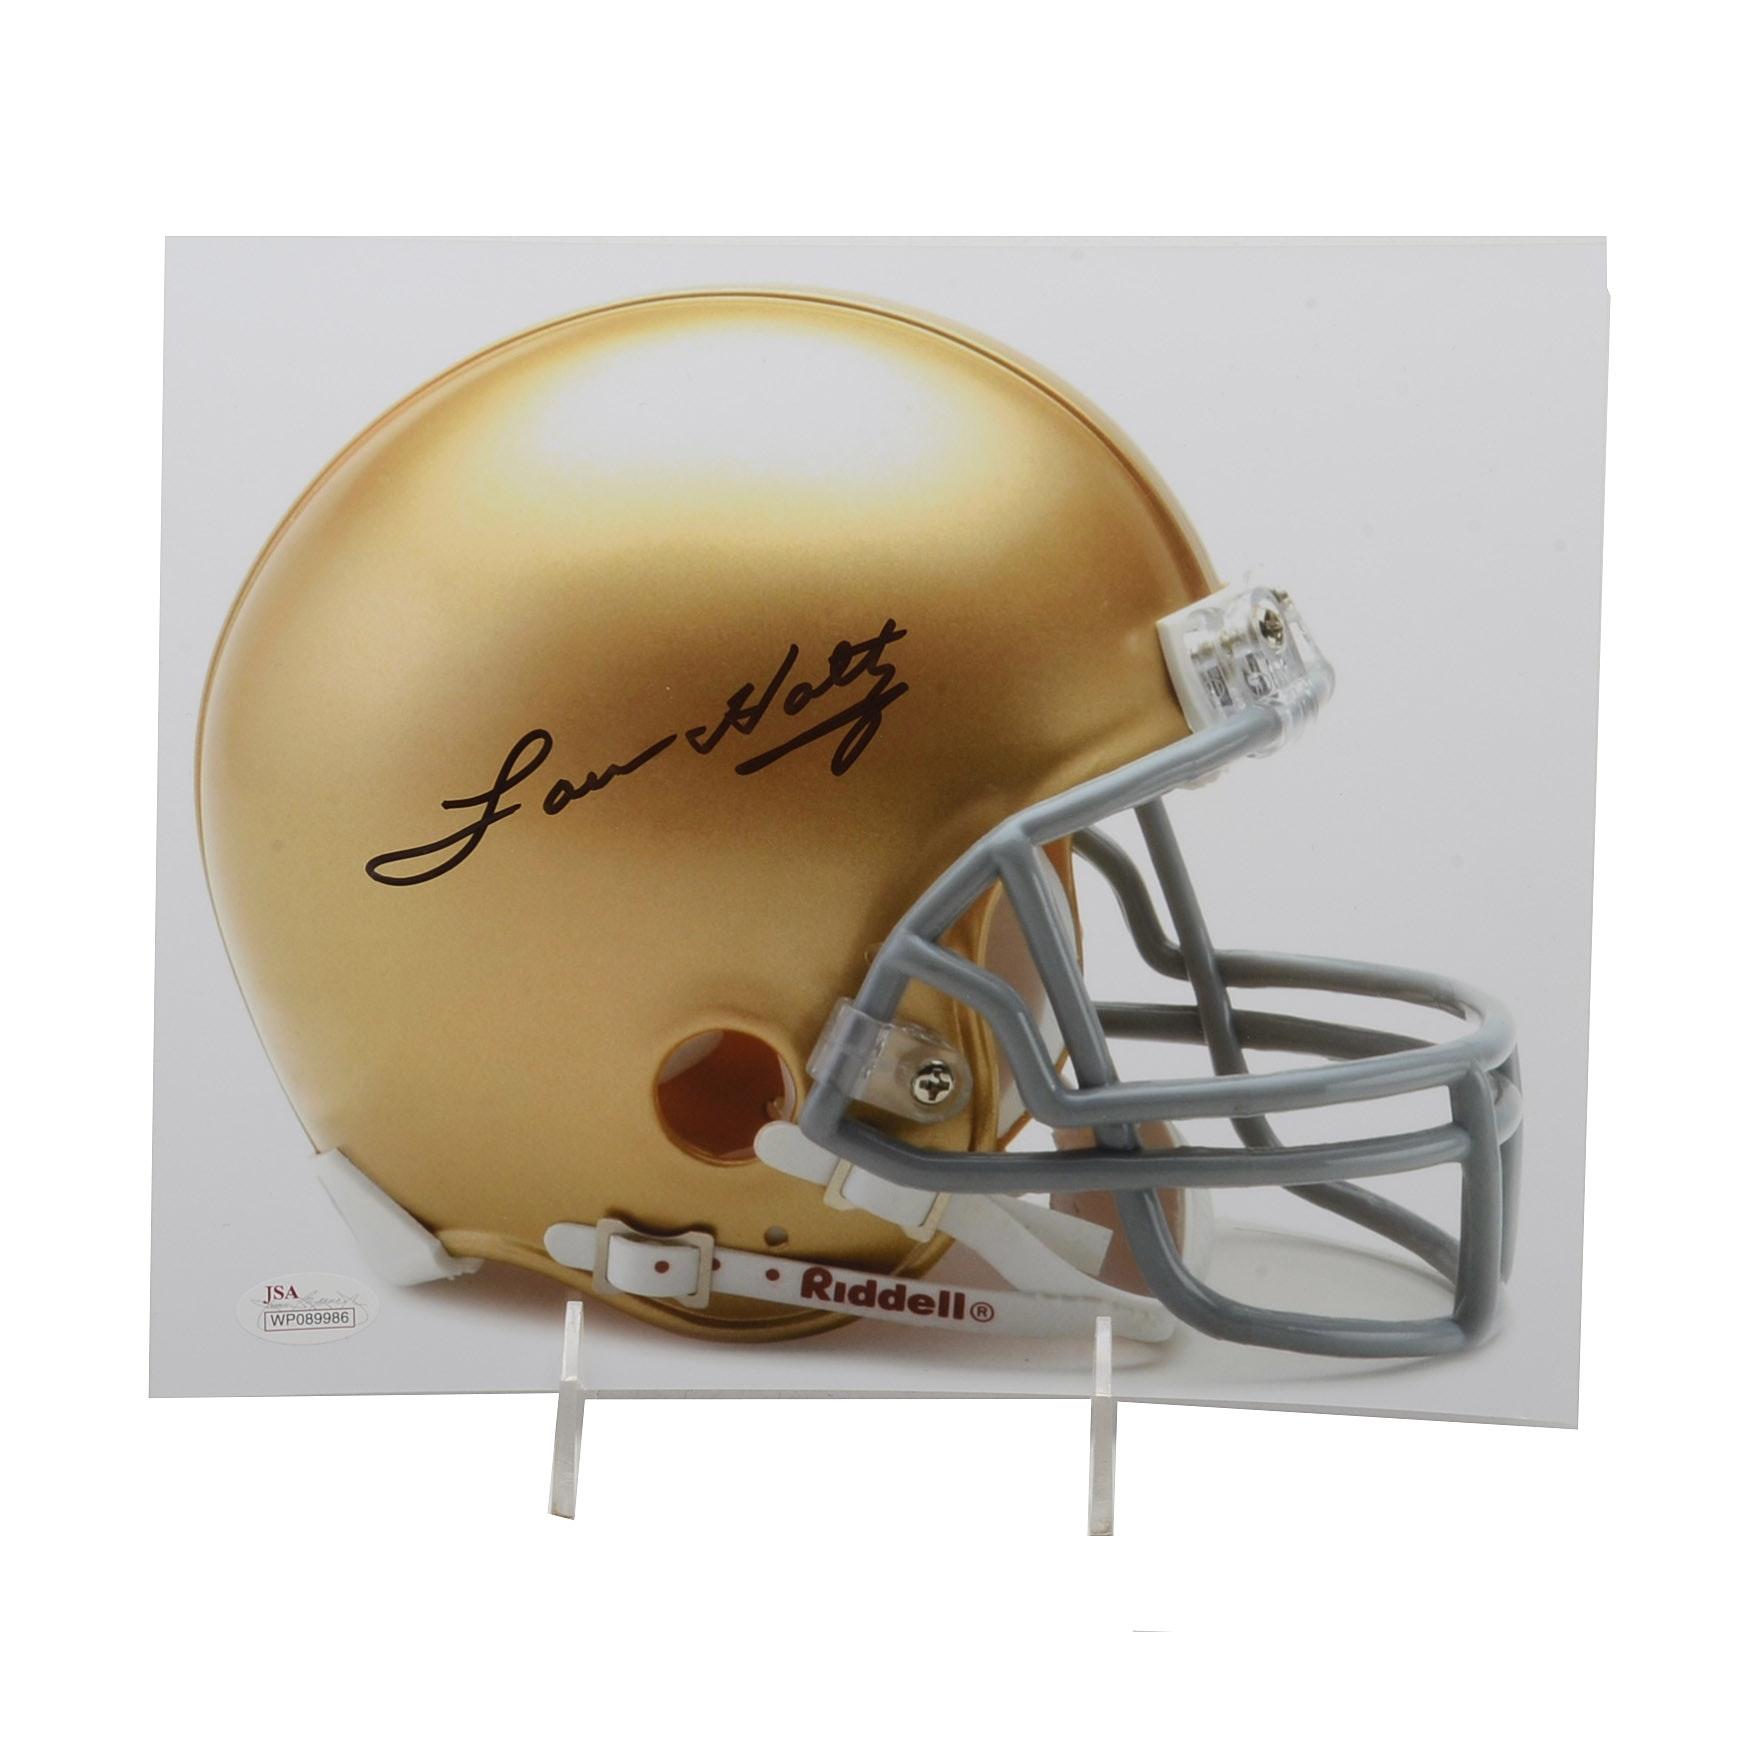 Lou Holtz Signed Notre Dame Photo  COA